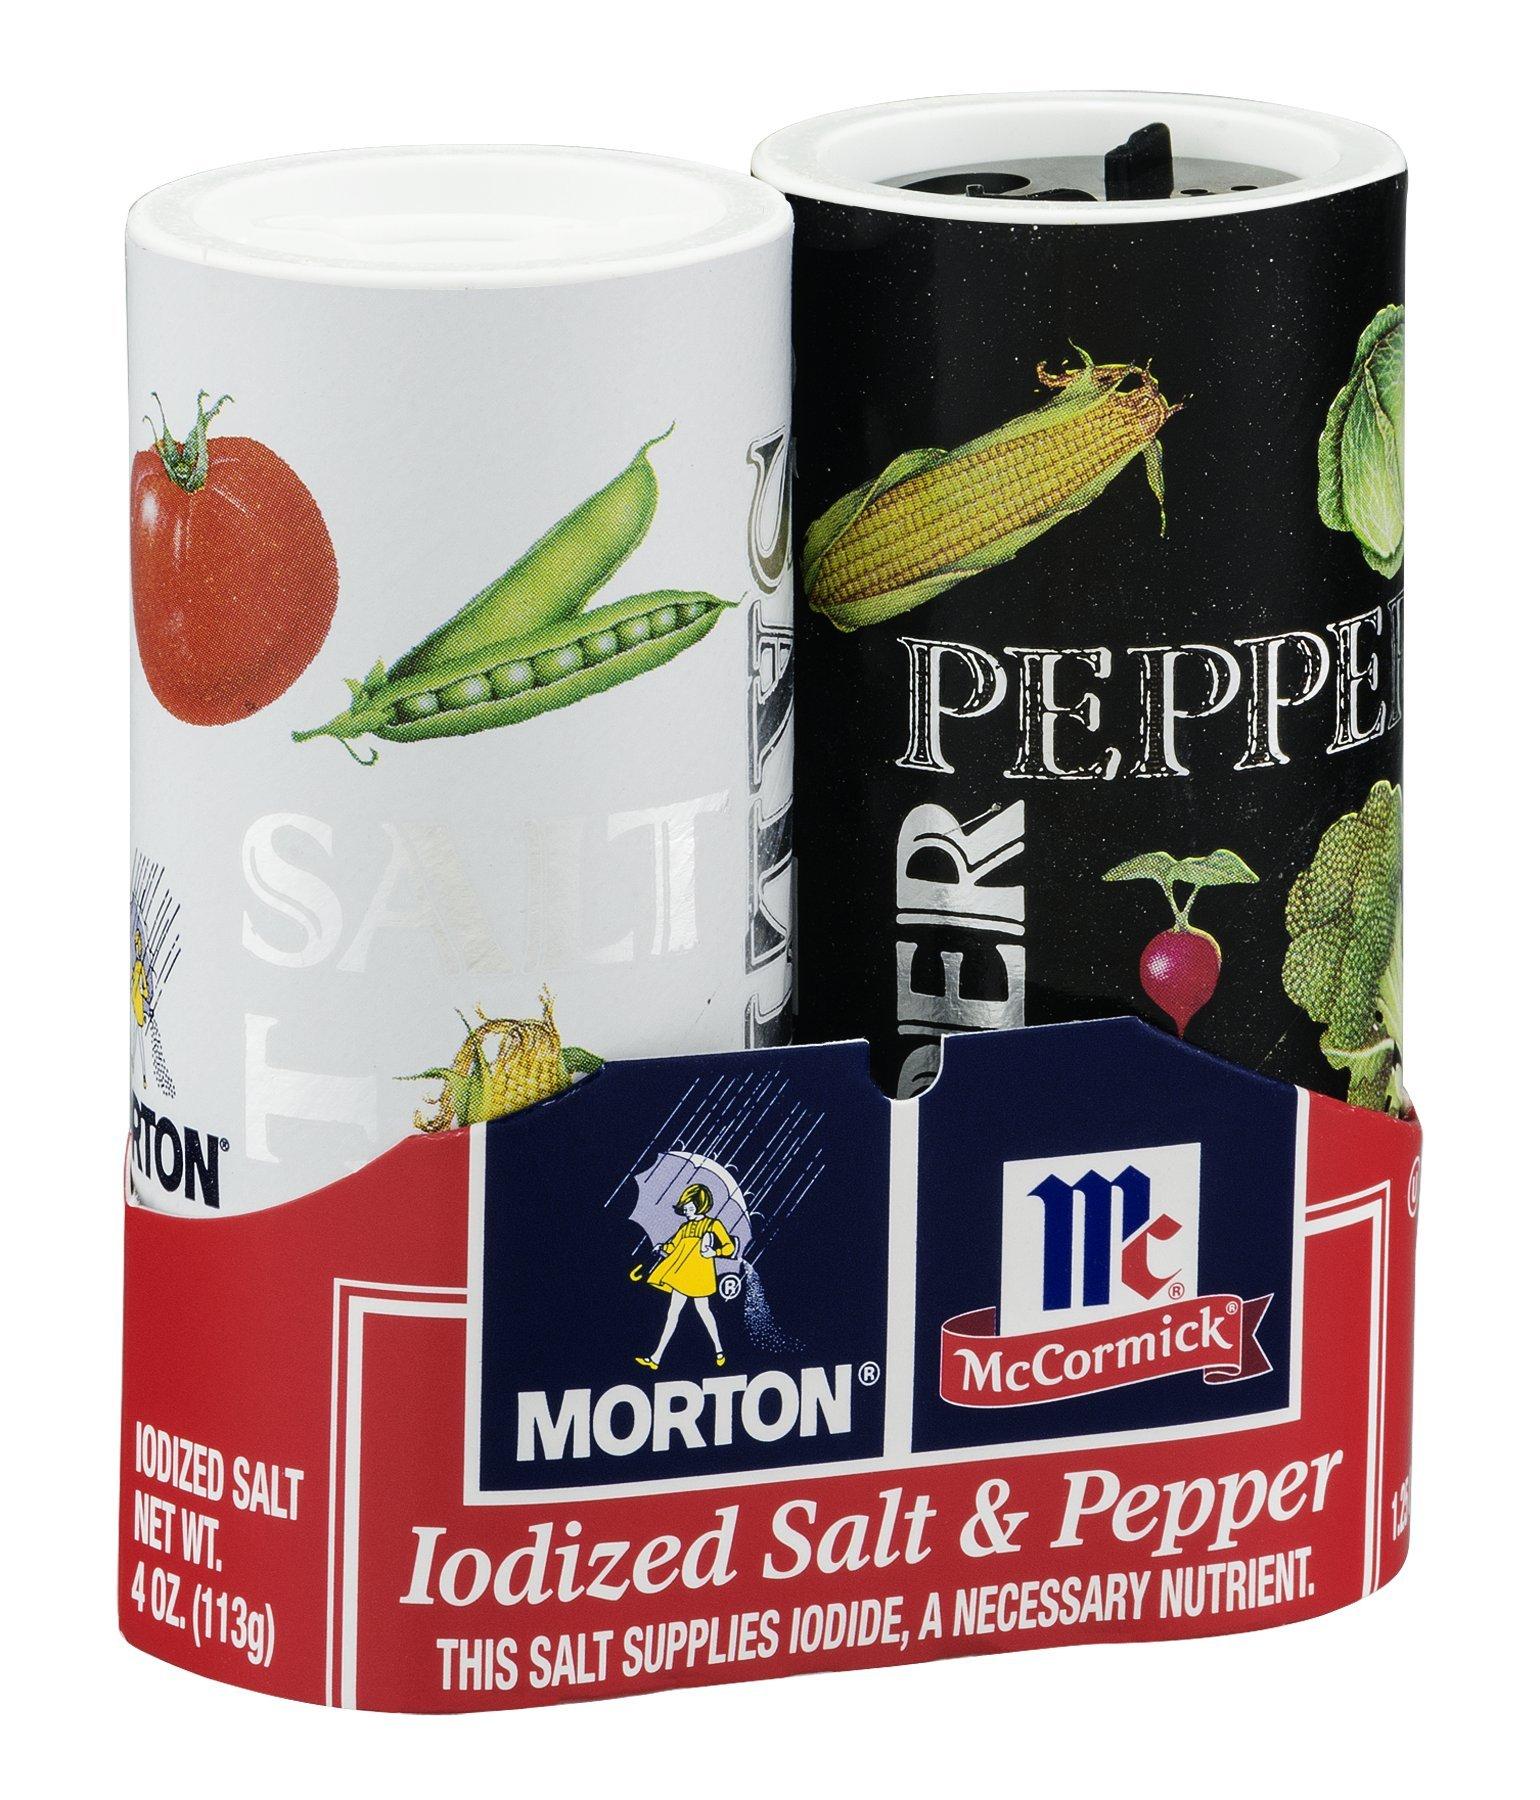 Morton McCormick Iodized Salt & Pepper, 5.25 OZ (Pack of 12)